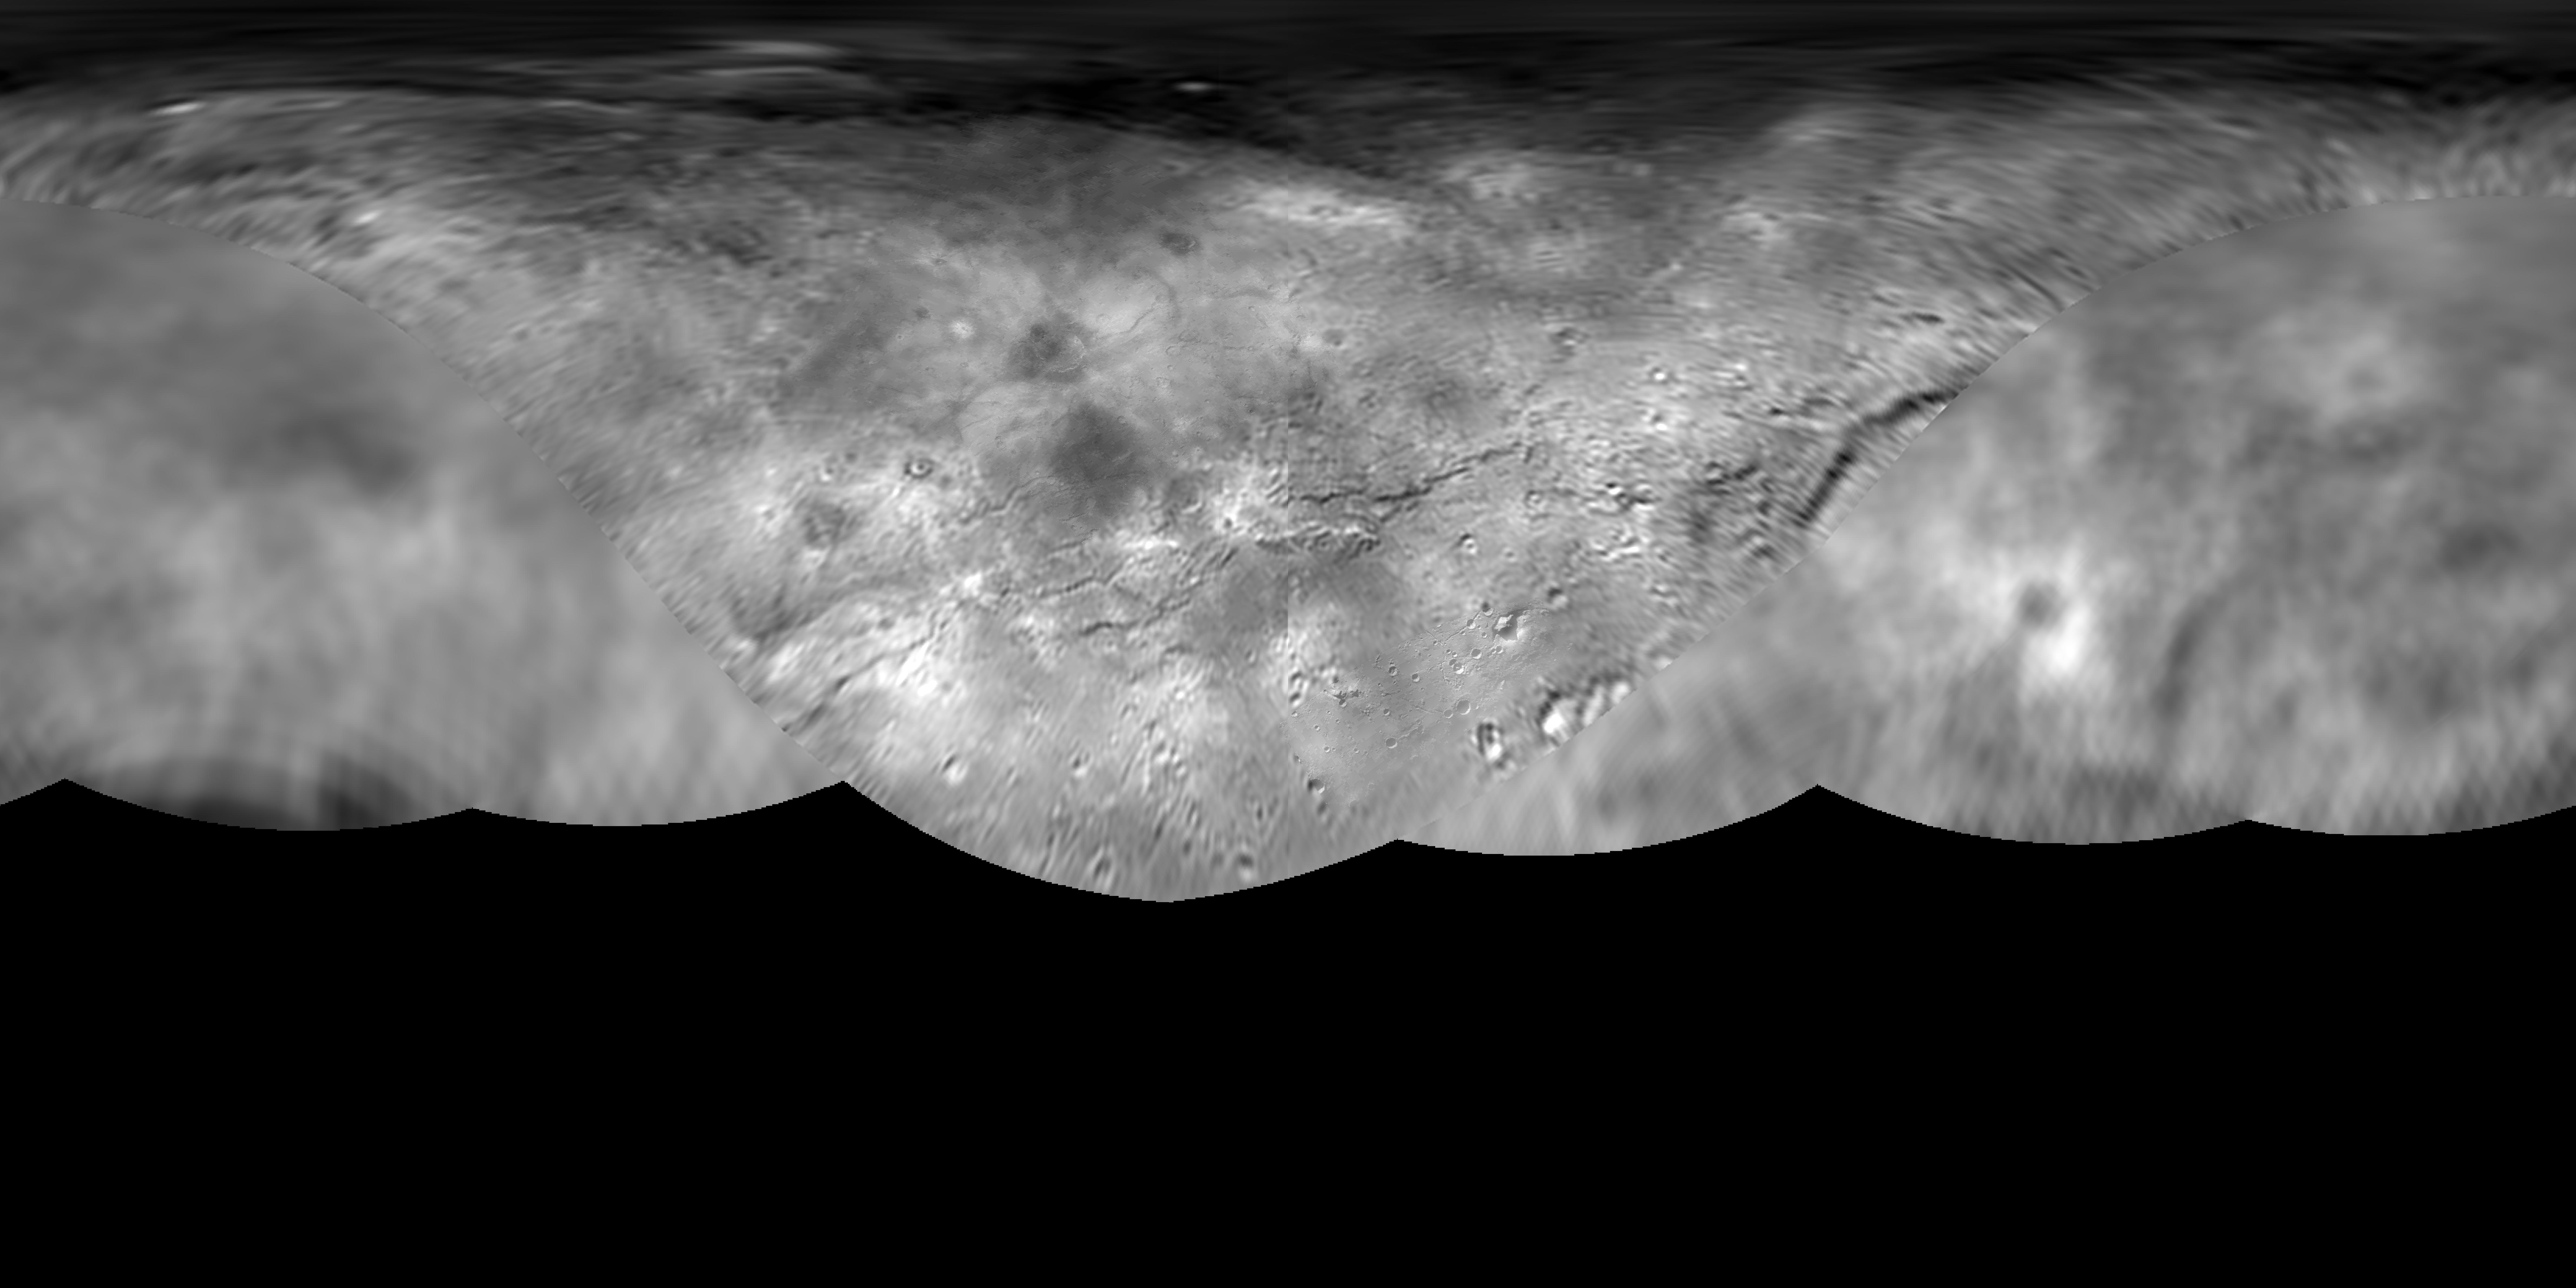 Charon Moon: UFO SIGHTINGS DAILY: Docked Ship Found On Pluto's Moon